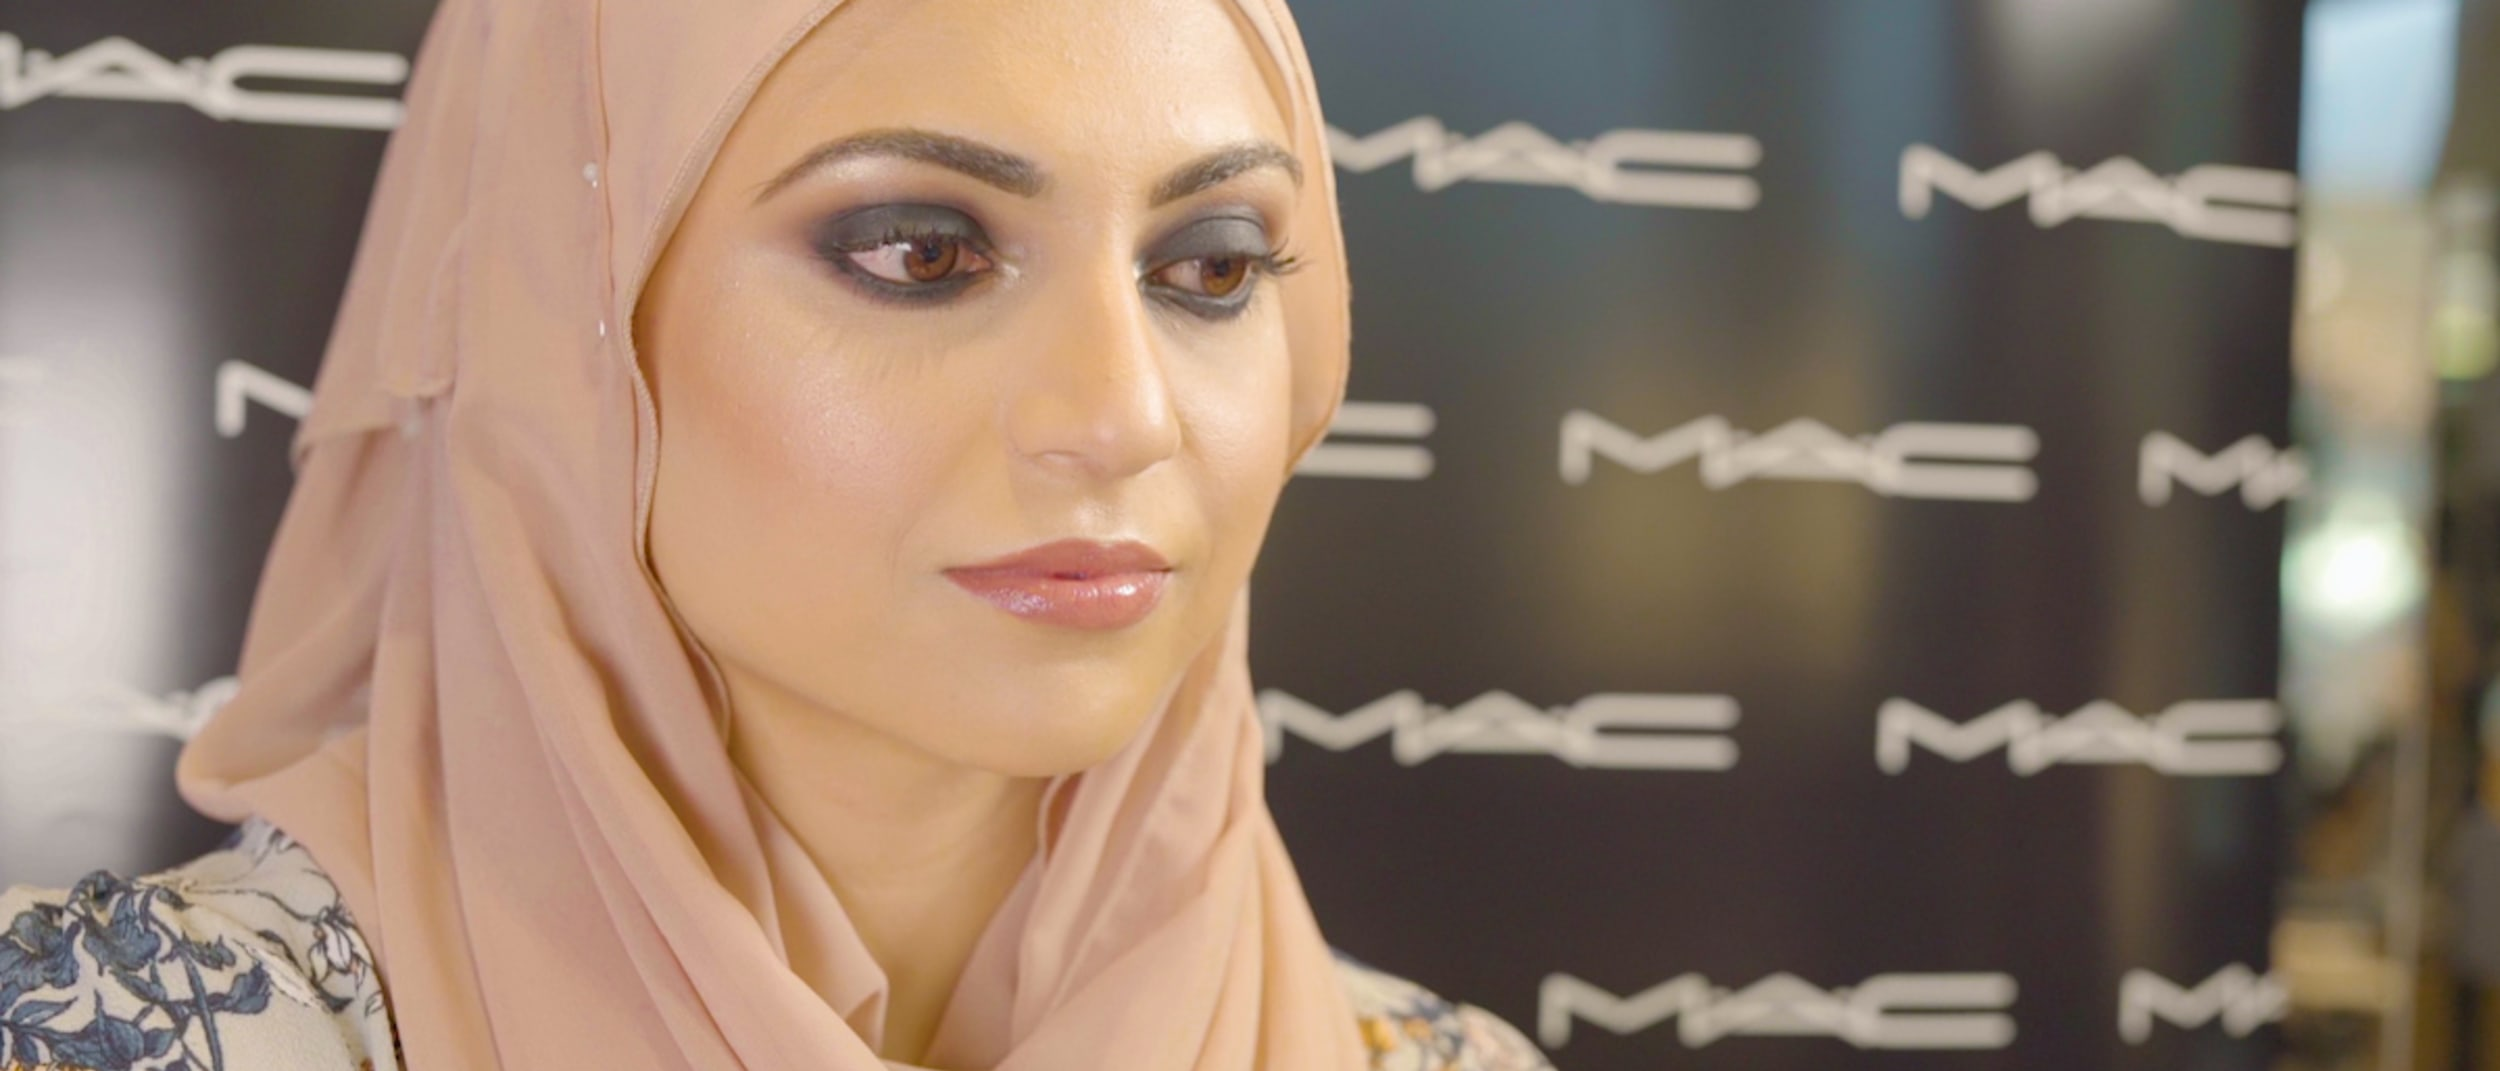 Get the look: Eid eyes by MAC Cosmetics